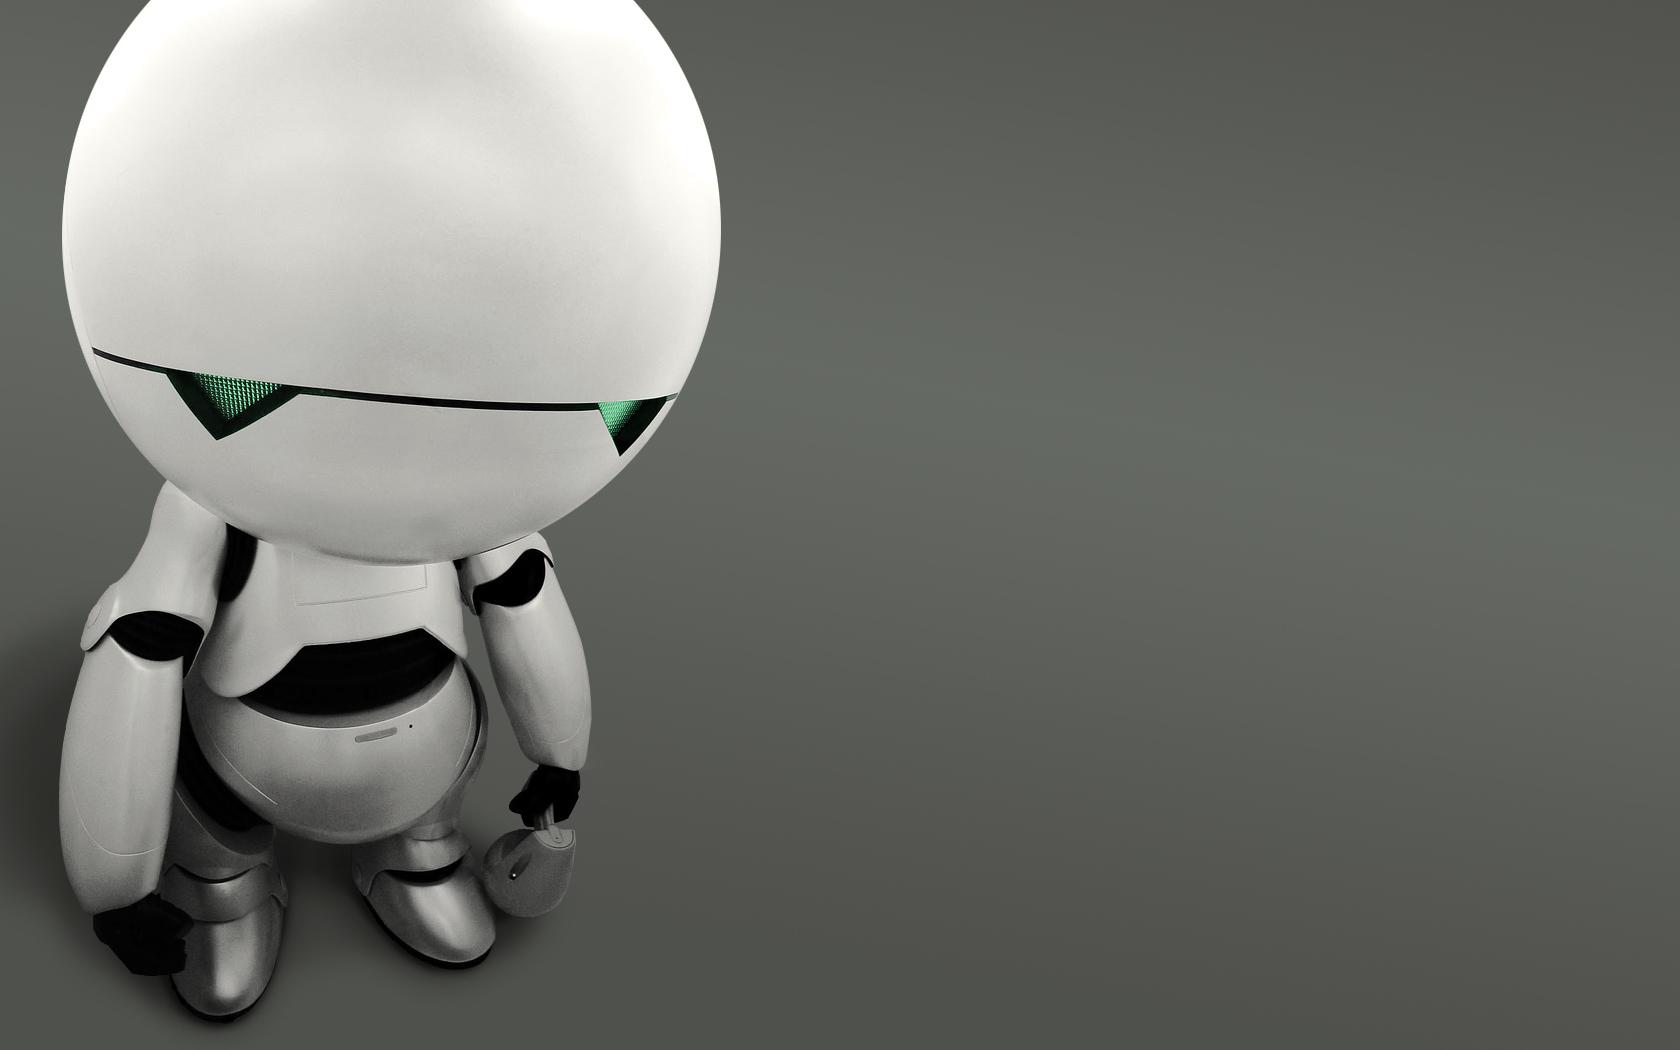 Lonely Robot Desktop Wallpapers One Lonely Robot Desktop Backgrounds 1680x1050